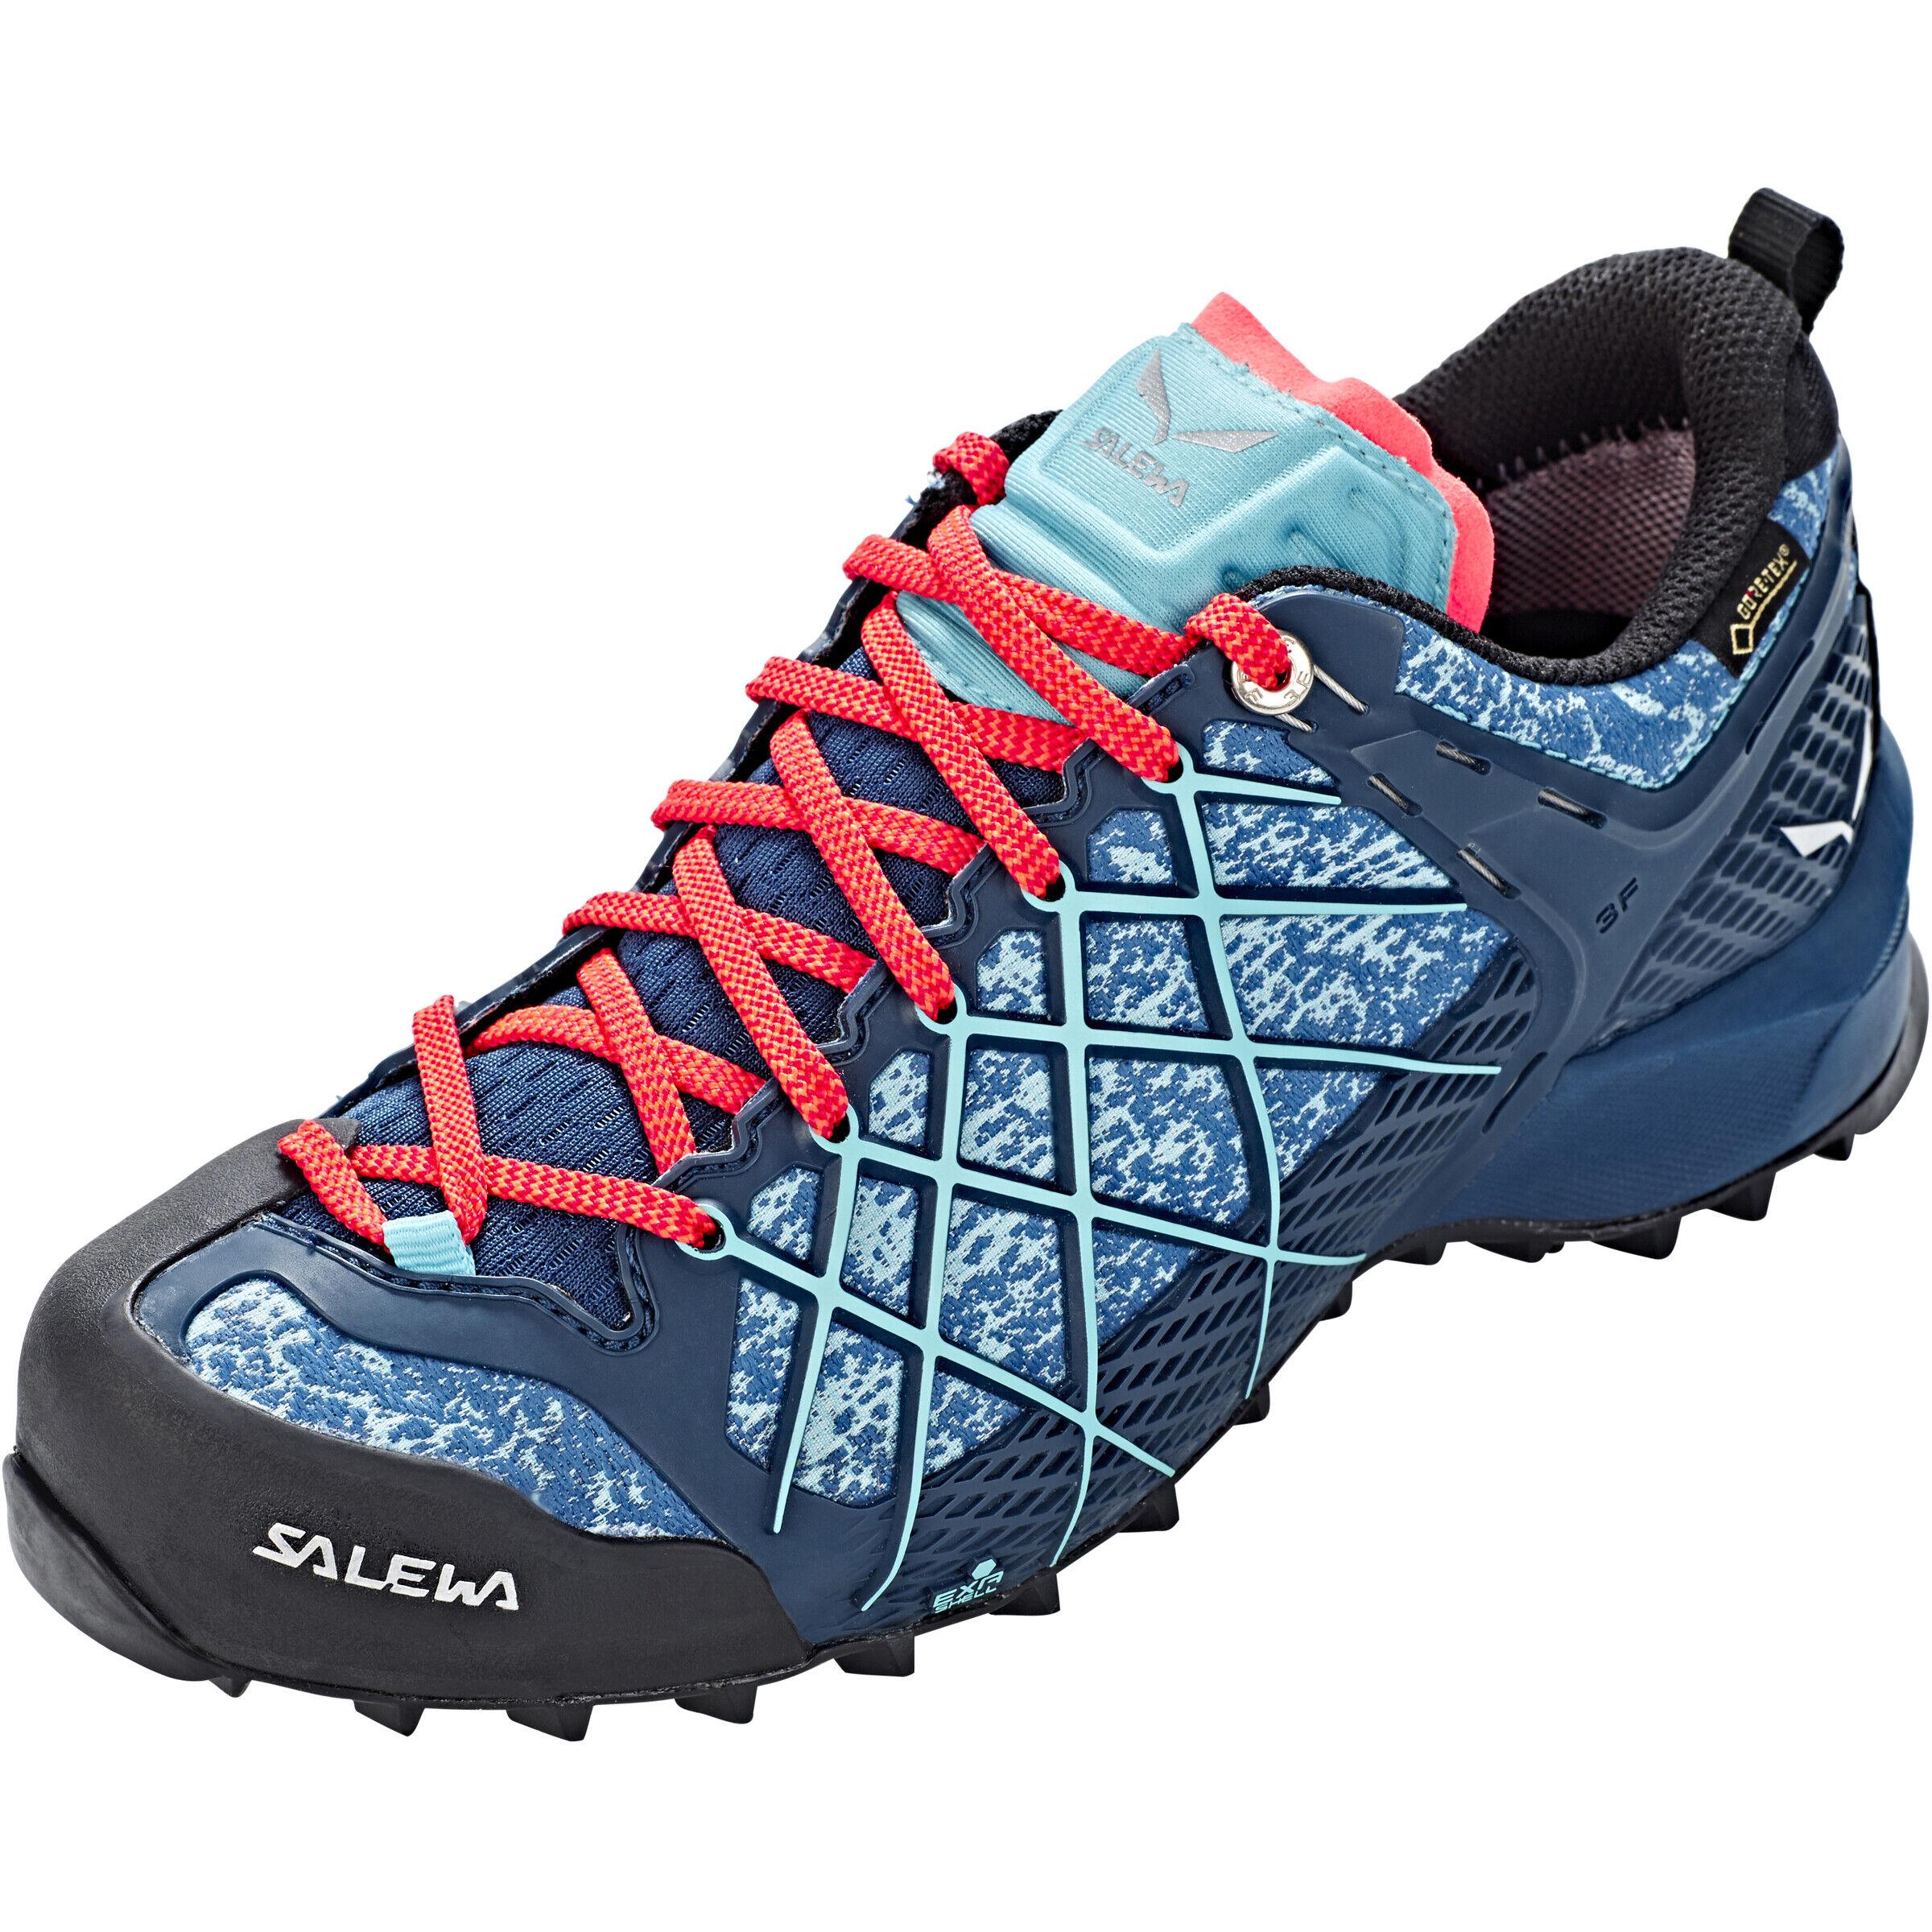 Outdoor Schuhe Damen Salewa Wildfire S Gtx Frauen